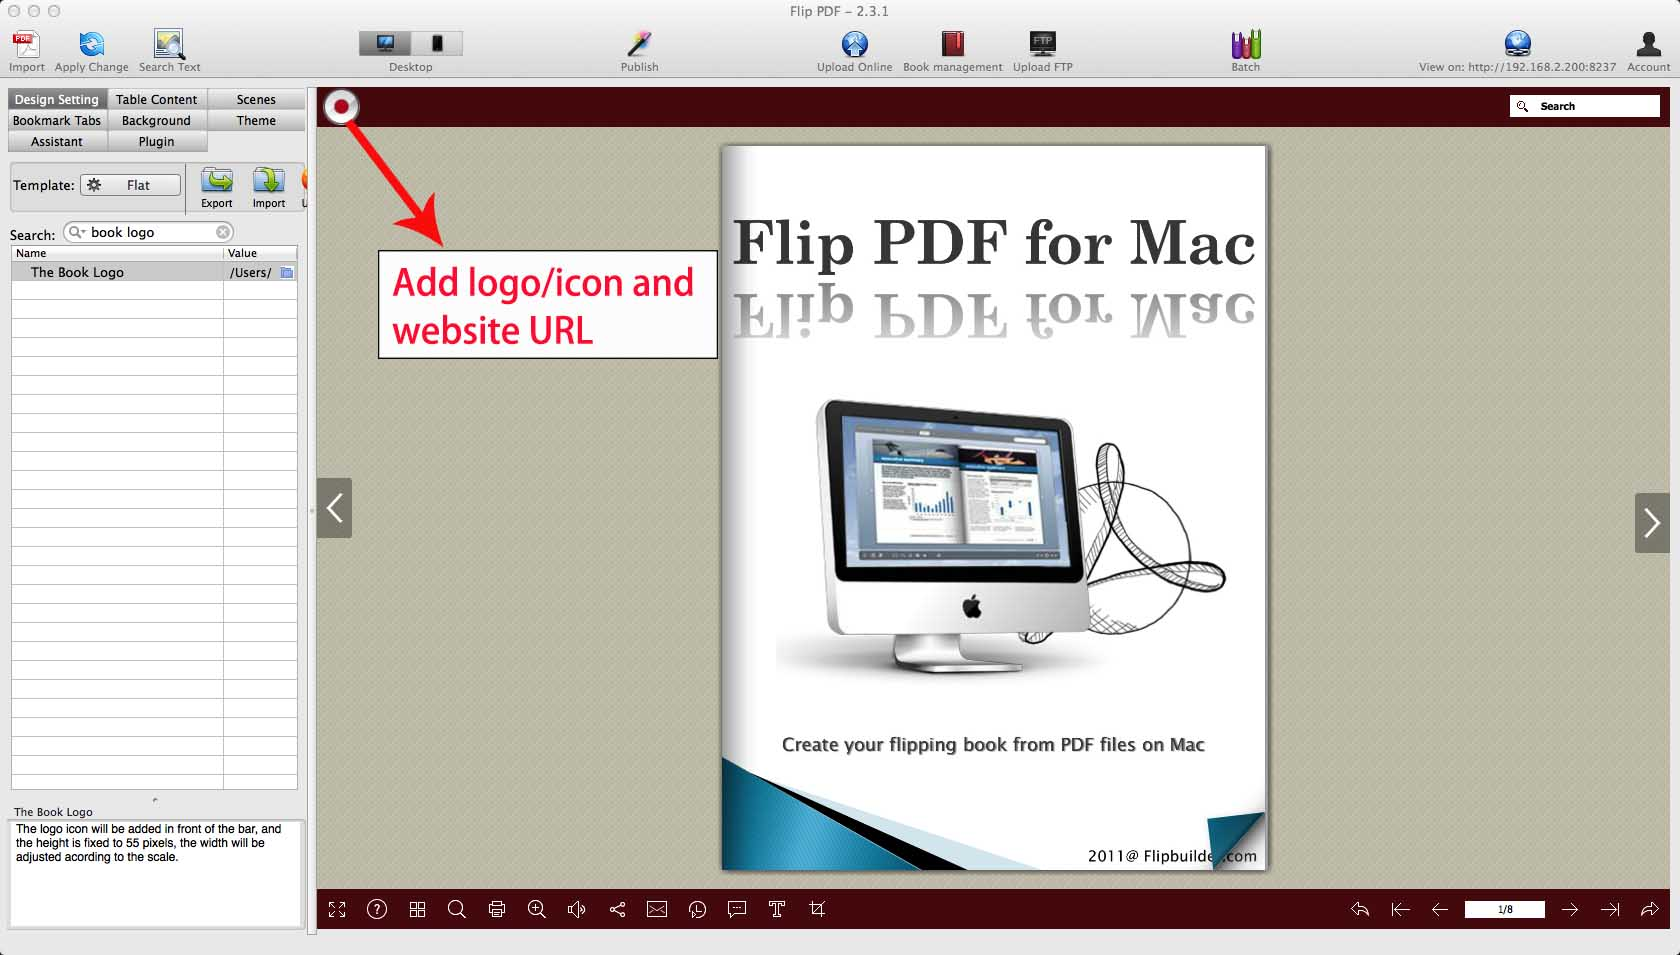 Flip Pdf For Mac Convert Pdf To Stunning Page Flipping Ebooks On